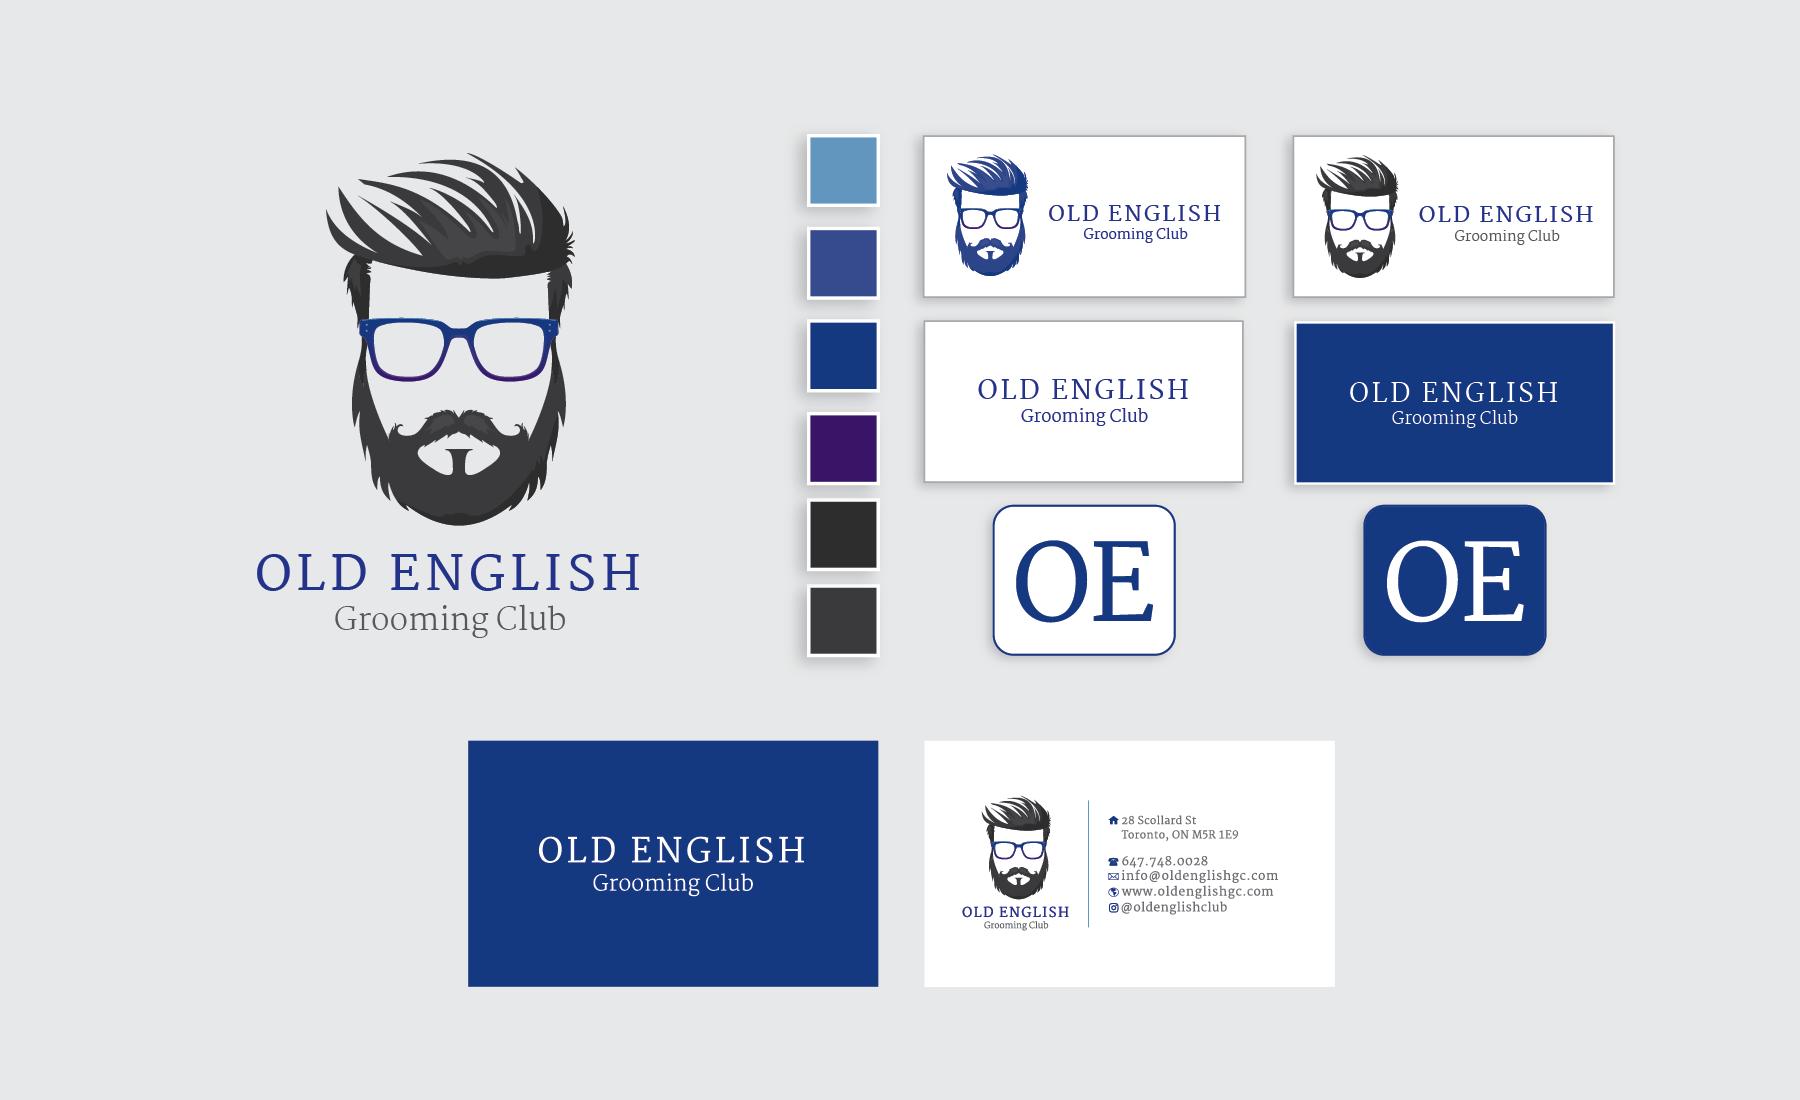 Old English Grooming Club Branding